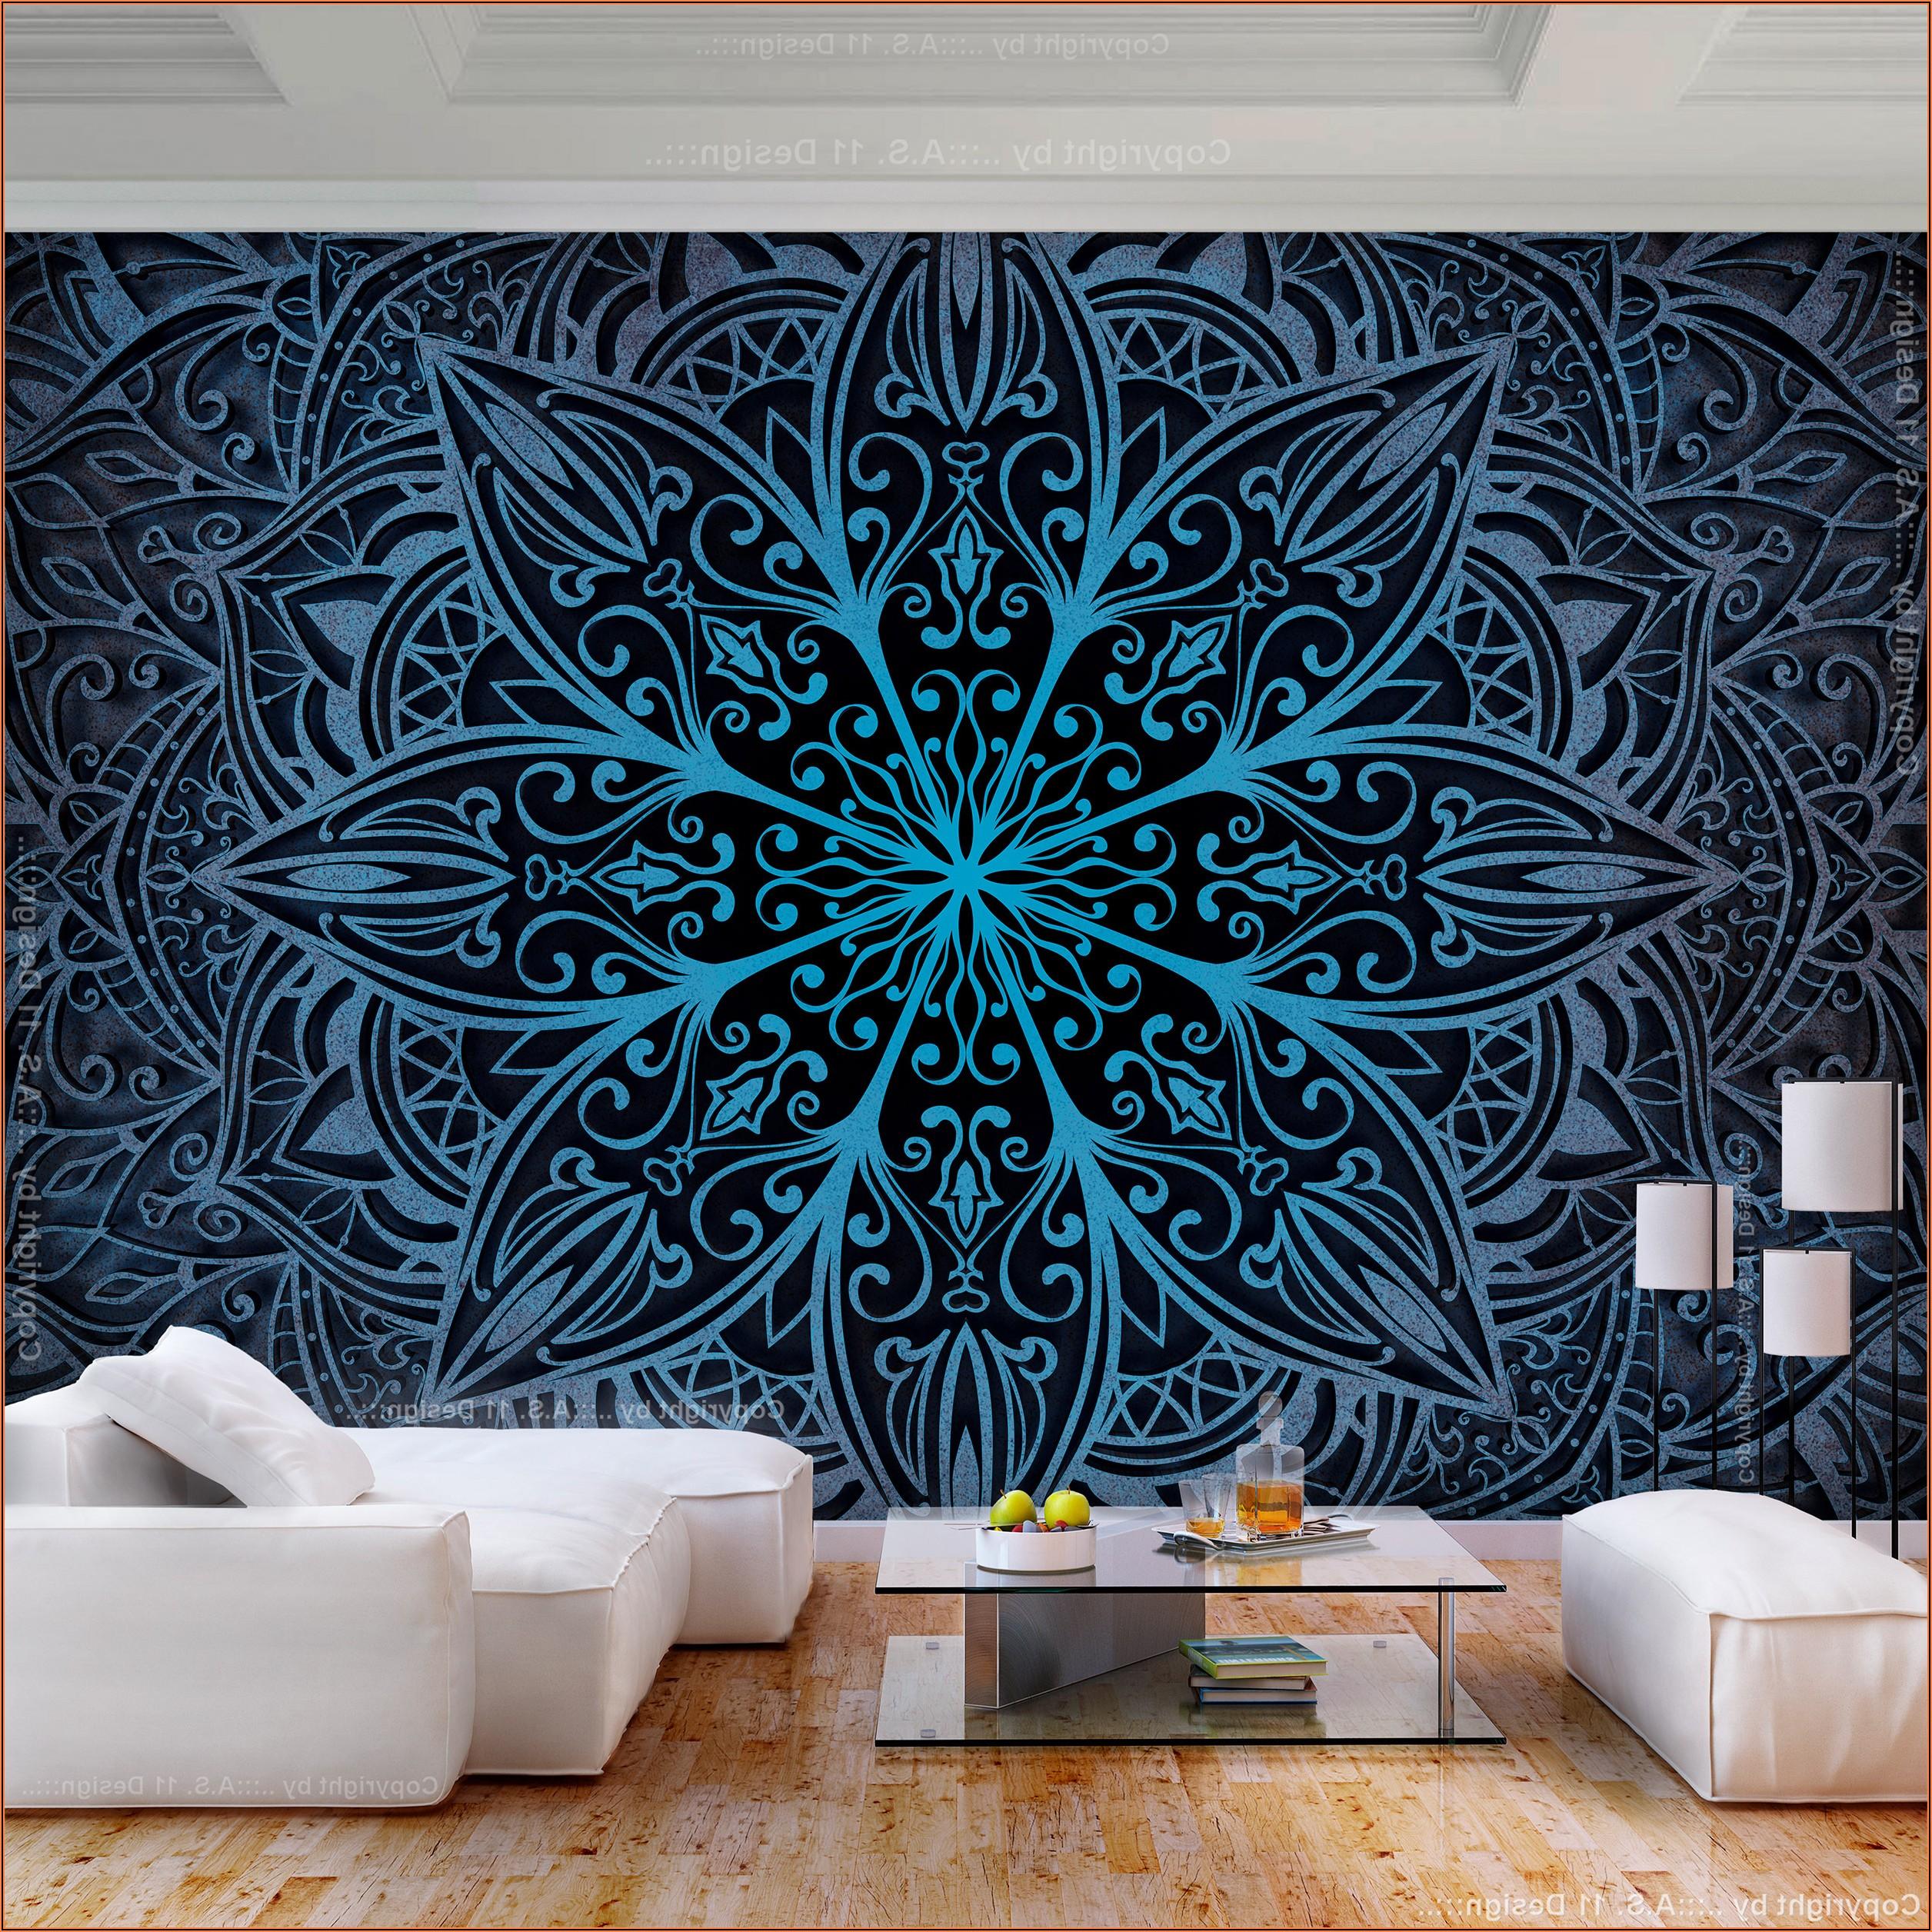 Mandala Bild Wohnzimmer